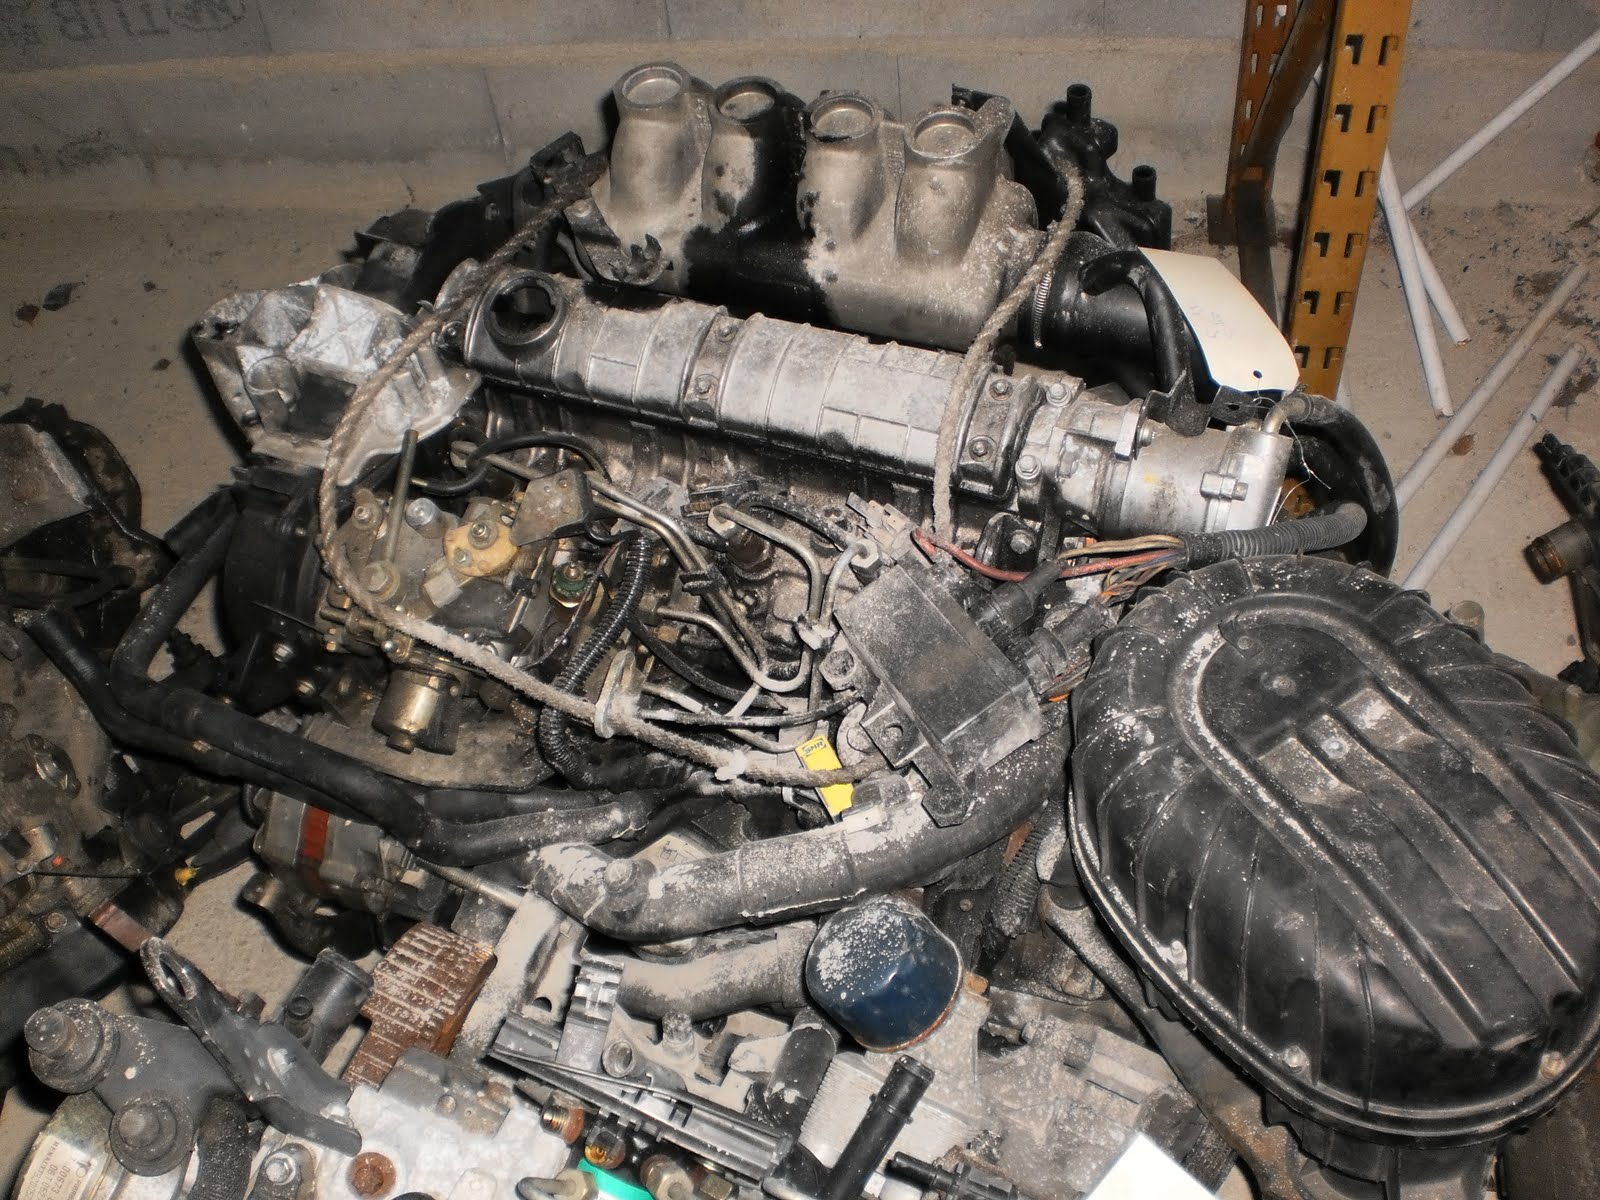 car export bader dijon pieces detachees d 39 occasion moteur renault r21 traffic r25 diesel. Black Bedroom Furniture Sets. Home Design Ideas